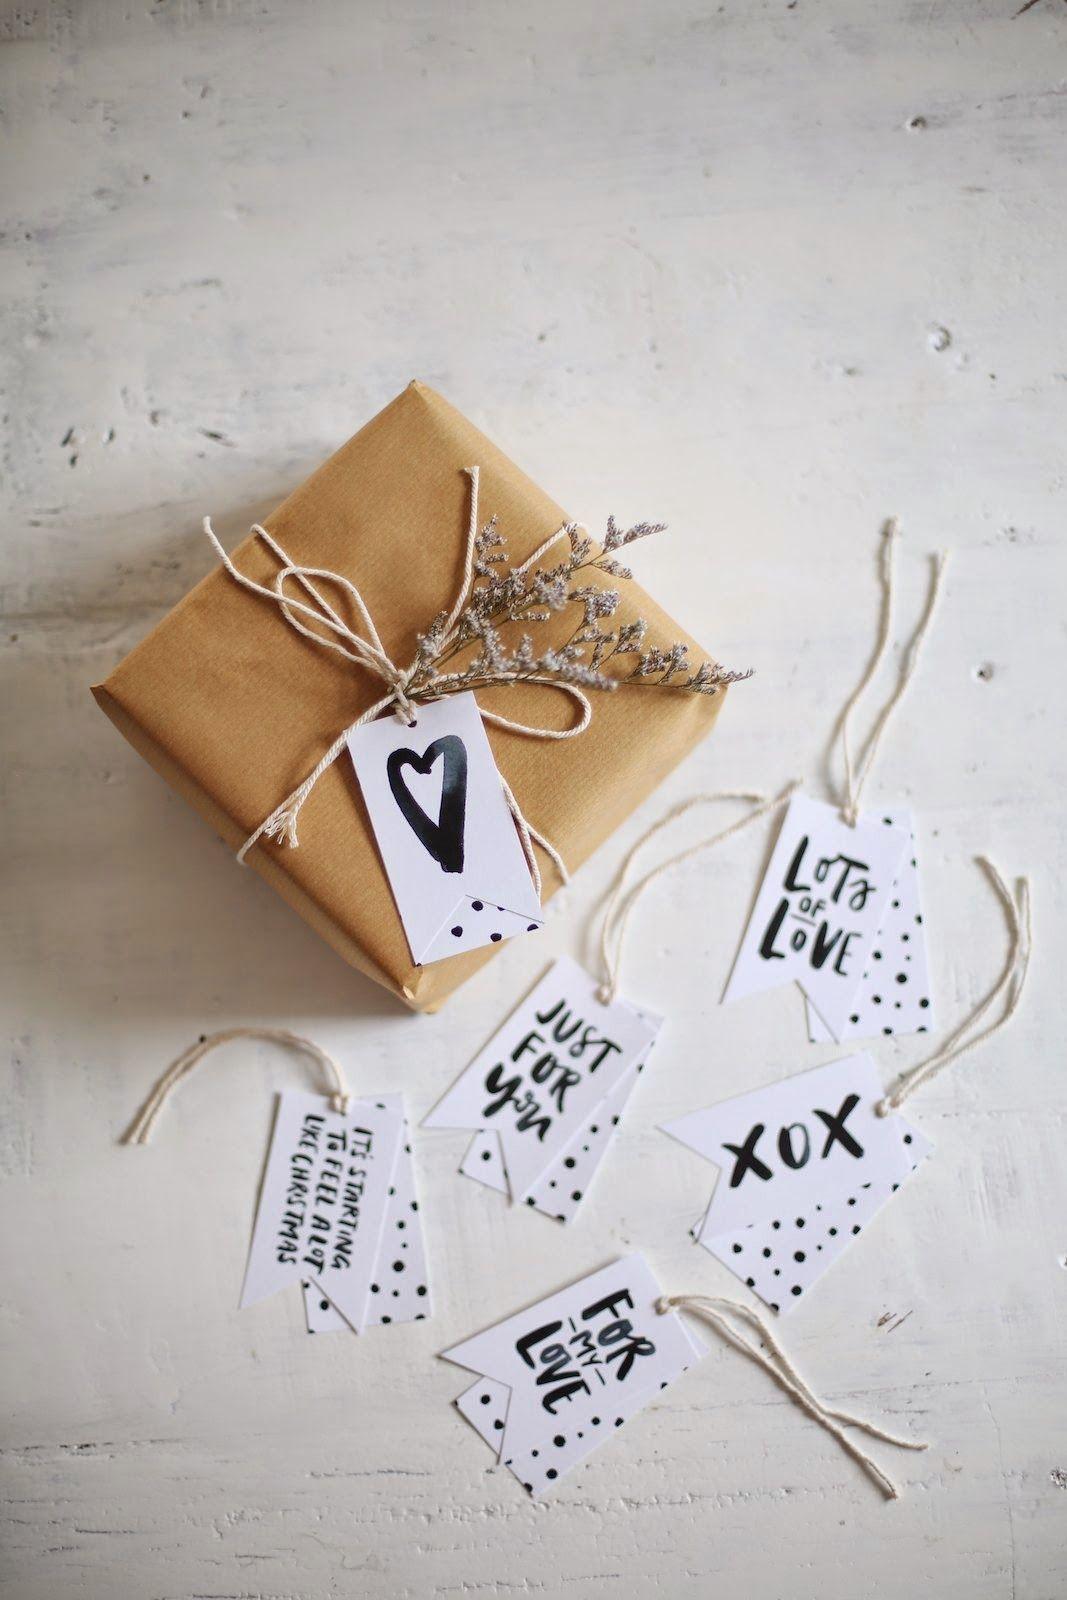 News du JOUR: LiebLinks KW 49 | Bastelarbeiten, Geschenke Verpacken ...